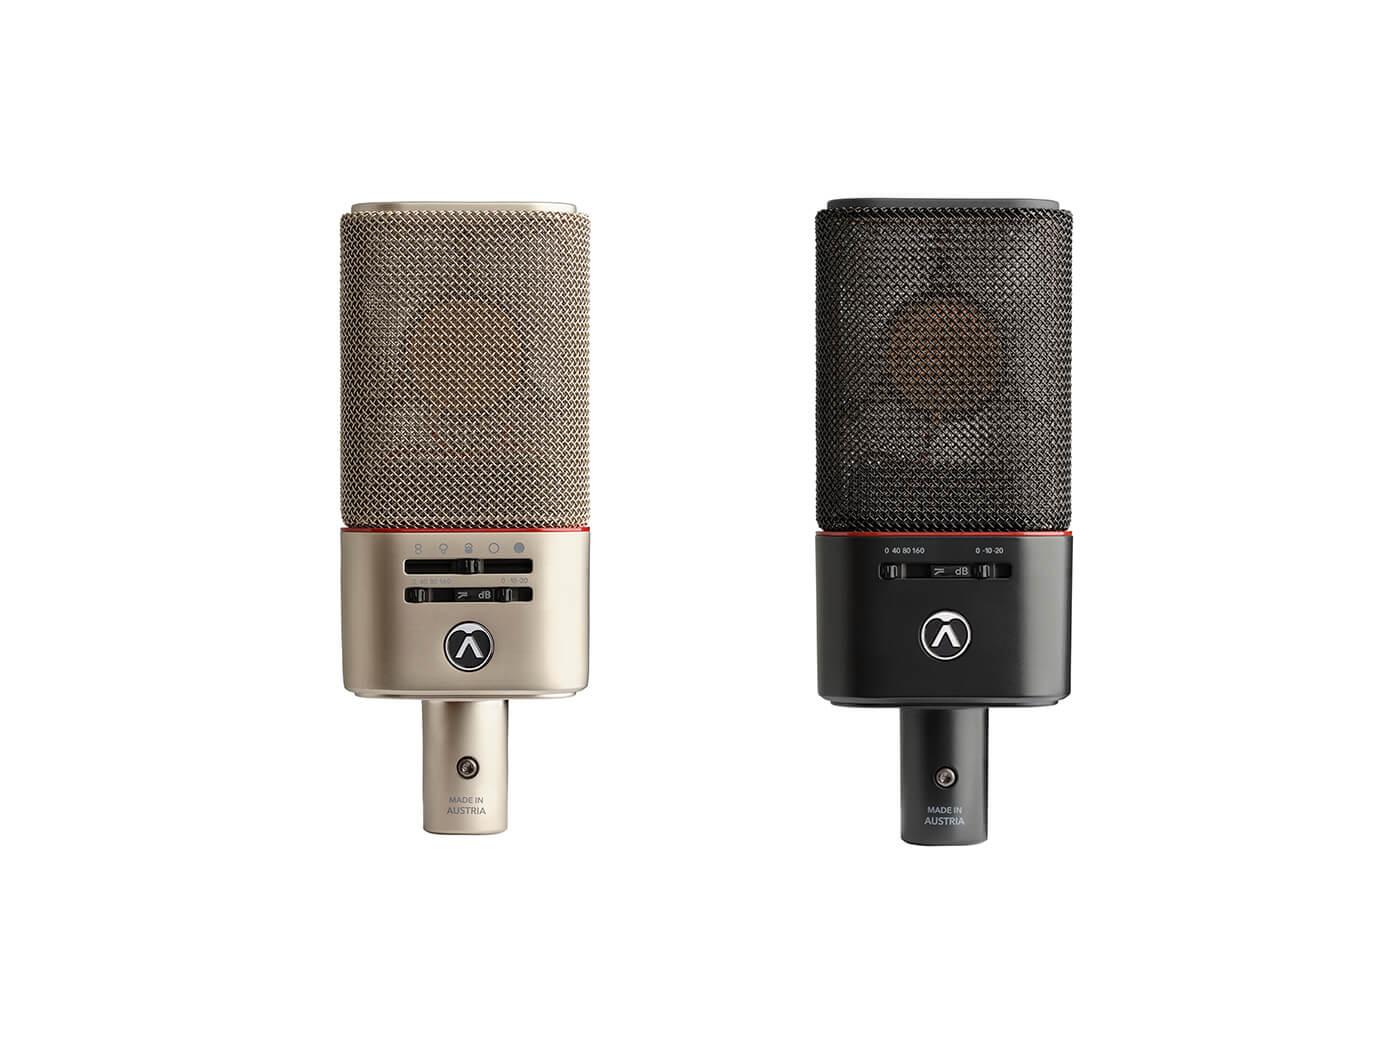 Austrian Audio OC18 and OC818